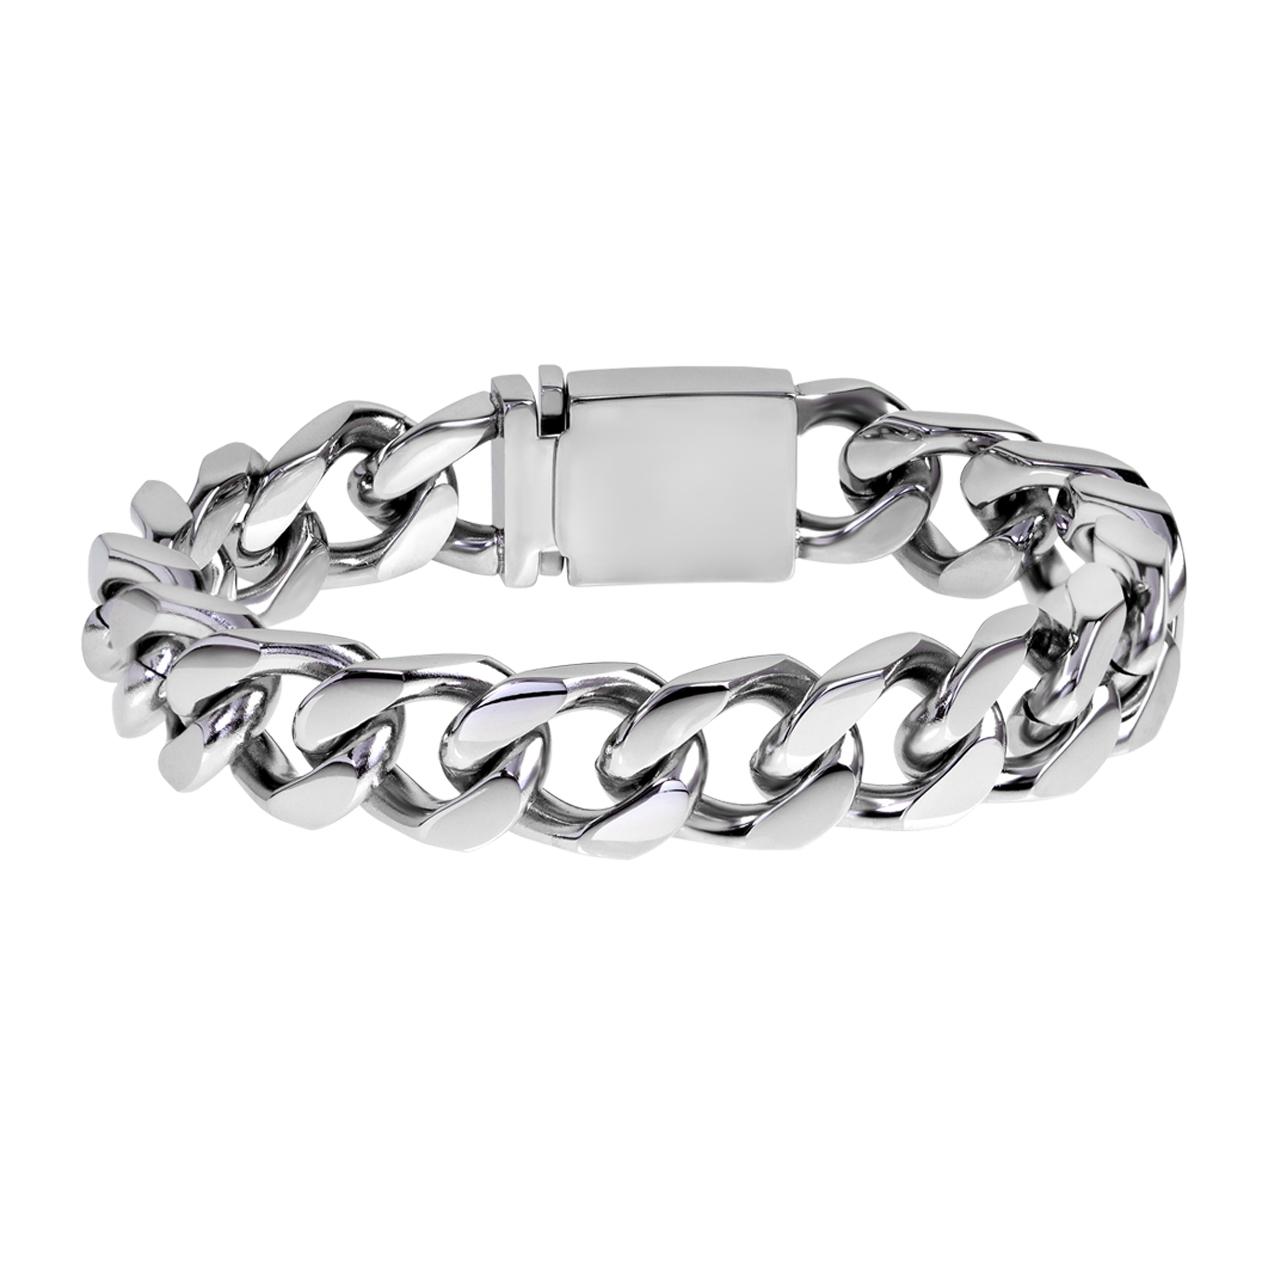 دستبند مردانه اقلیمه کد DS422